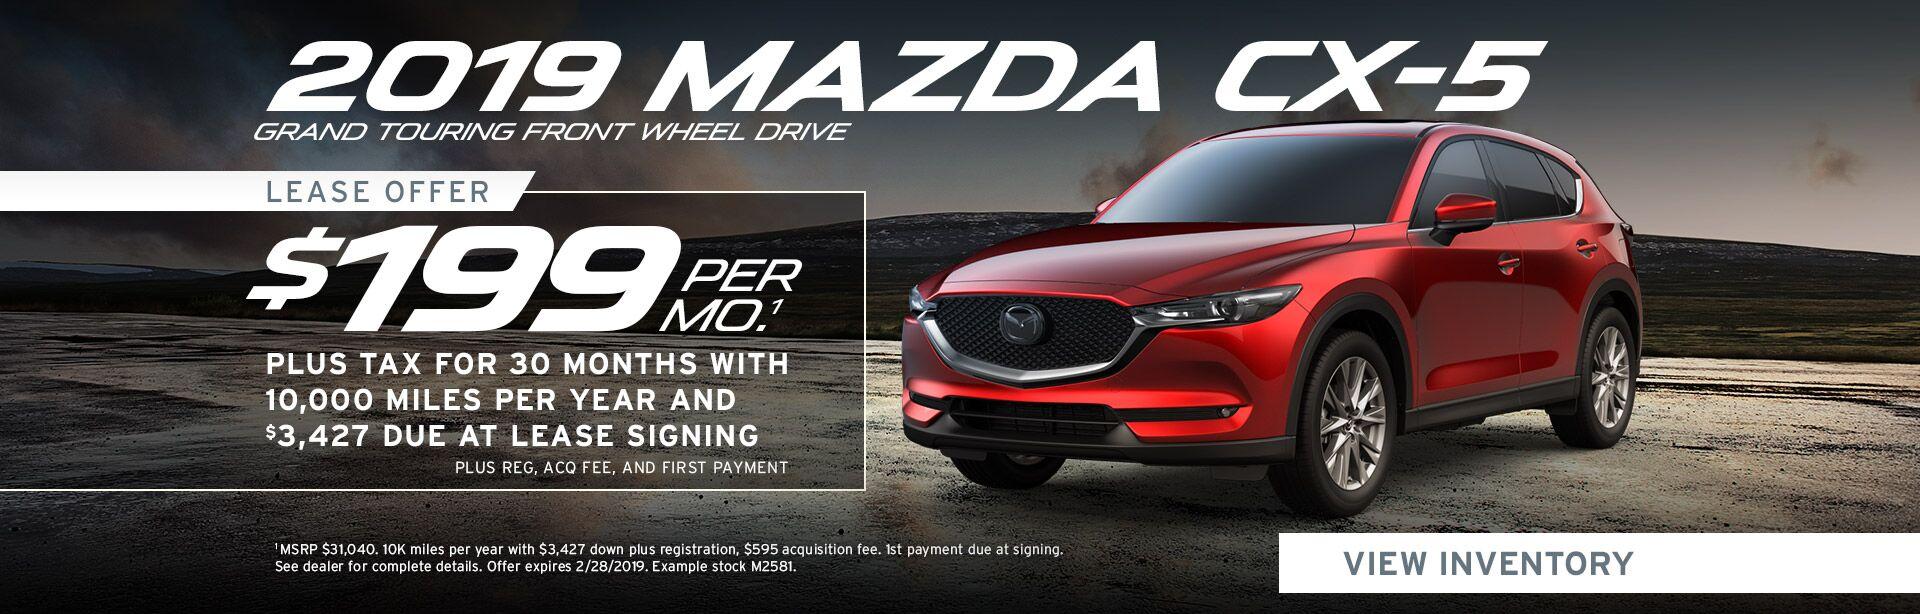 Corona California Mazda Dealership Cardinaleway Mazda Corona